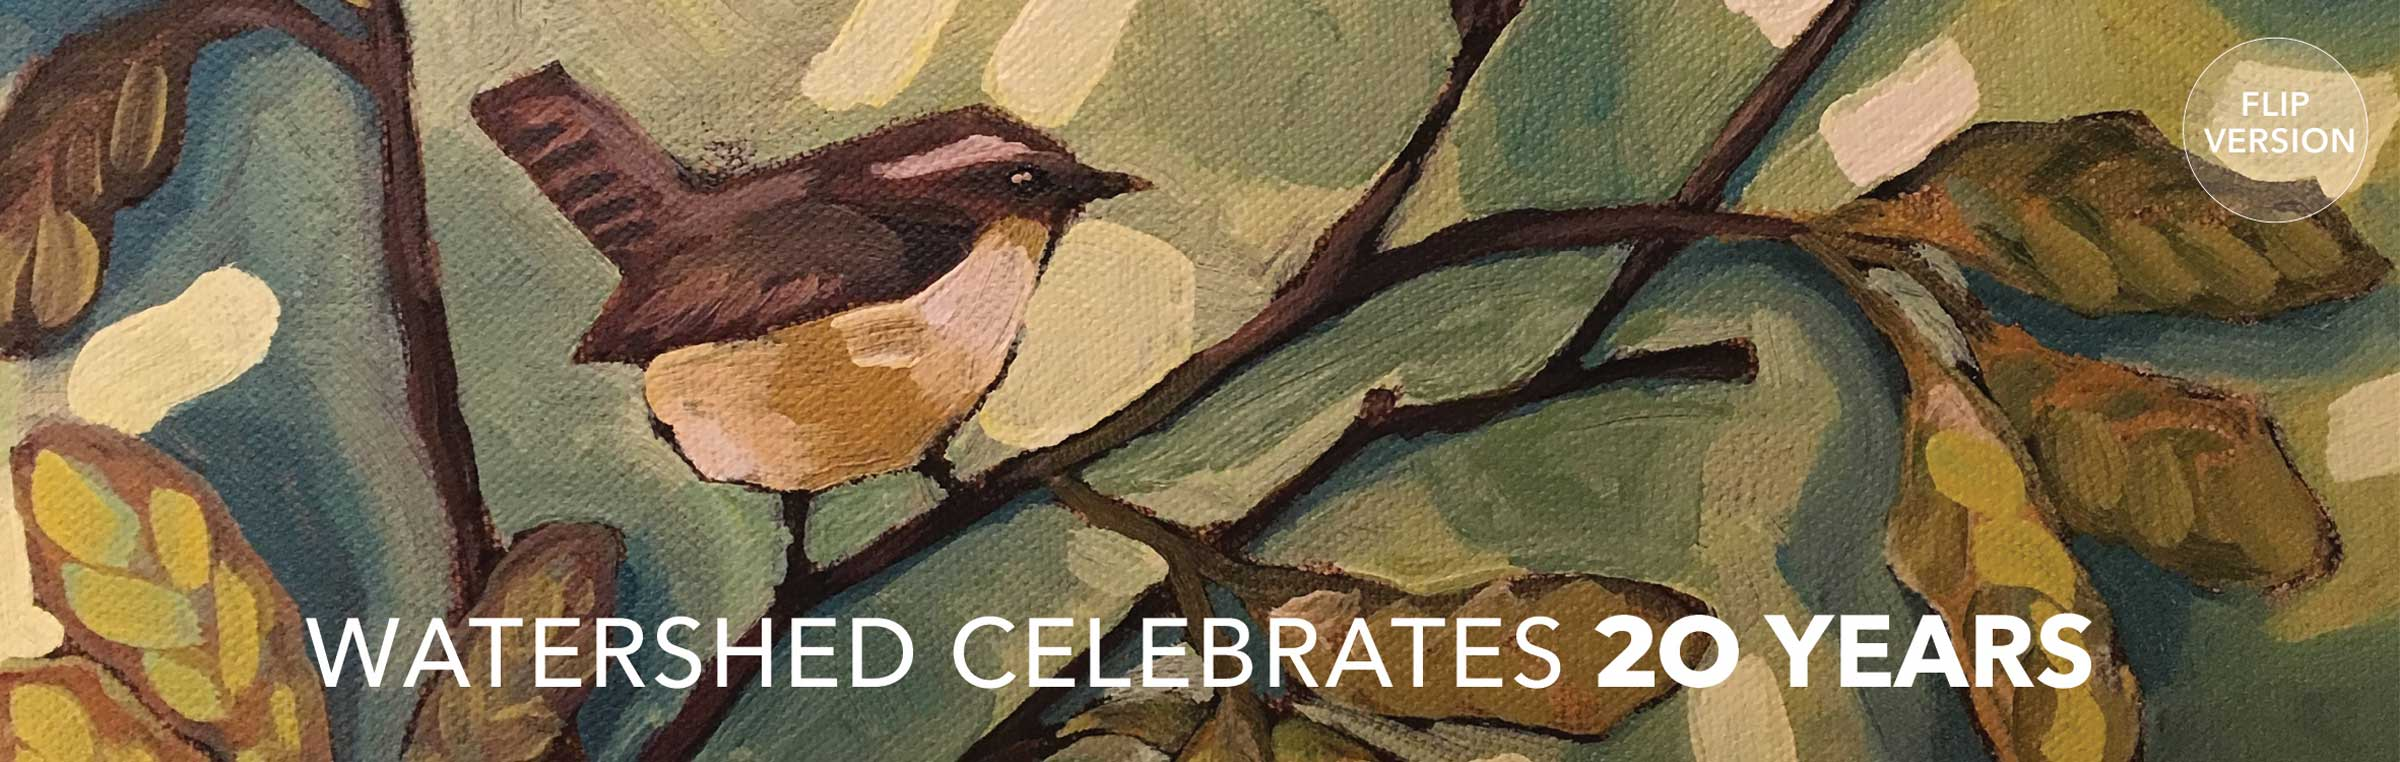 Watershed Celebrates 20 Years